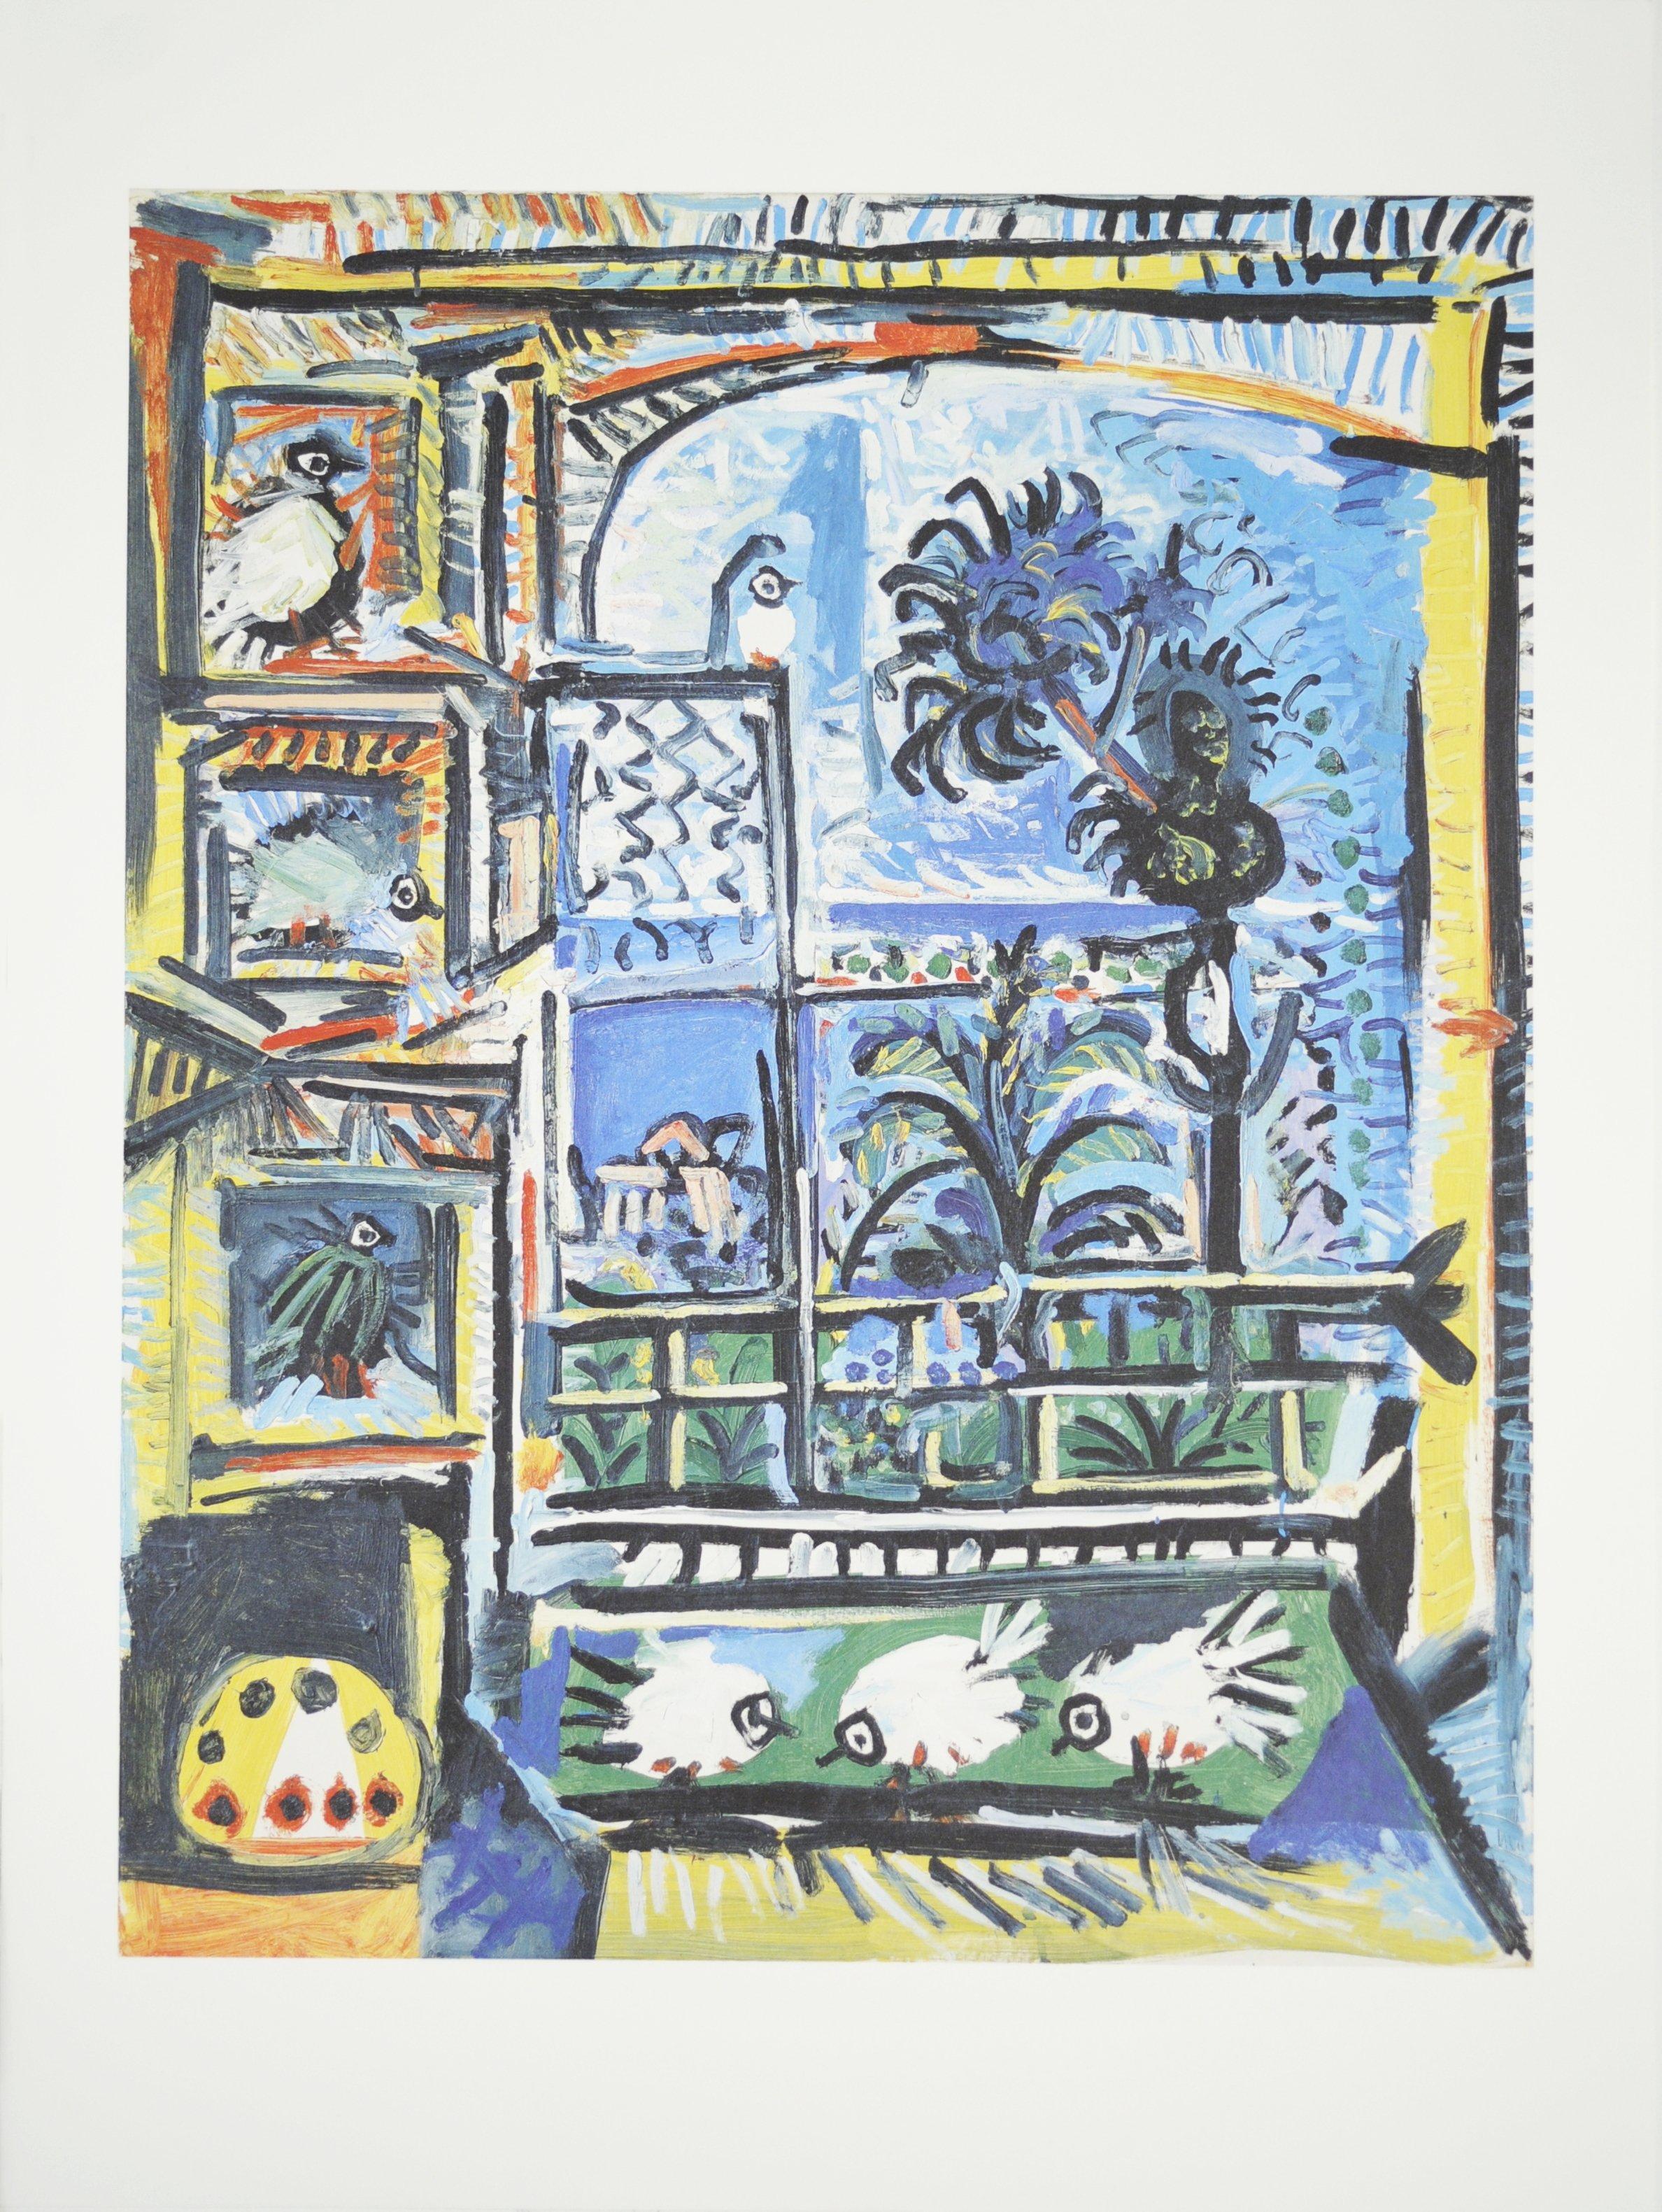 2012 Pablo Picasso 'Les Pigeons' Cubism Germany Offset Lithograph